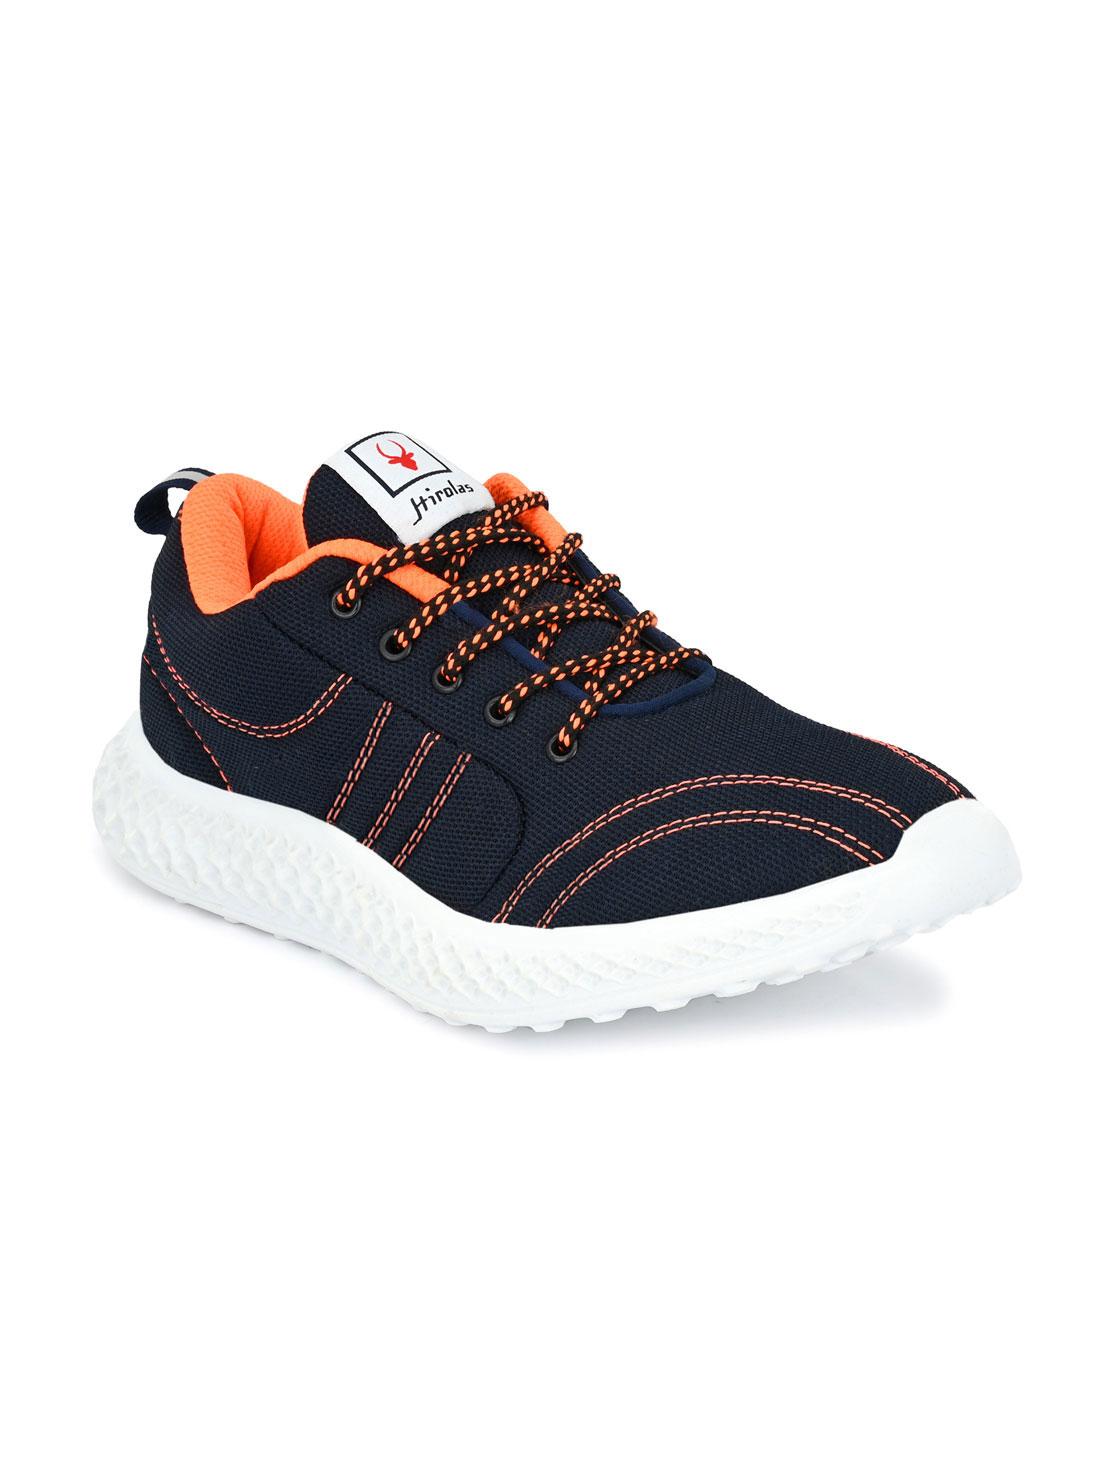 Hirolas | Hirolas® Men's Mesh Blue Gym/Running/Walking Sports Sneaker Shoes